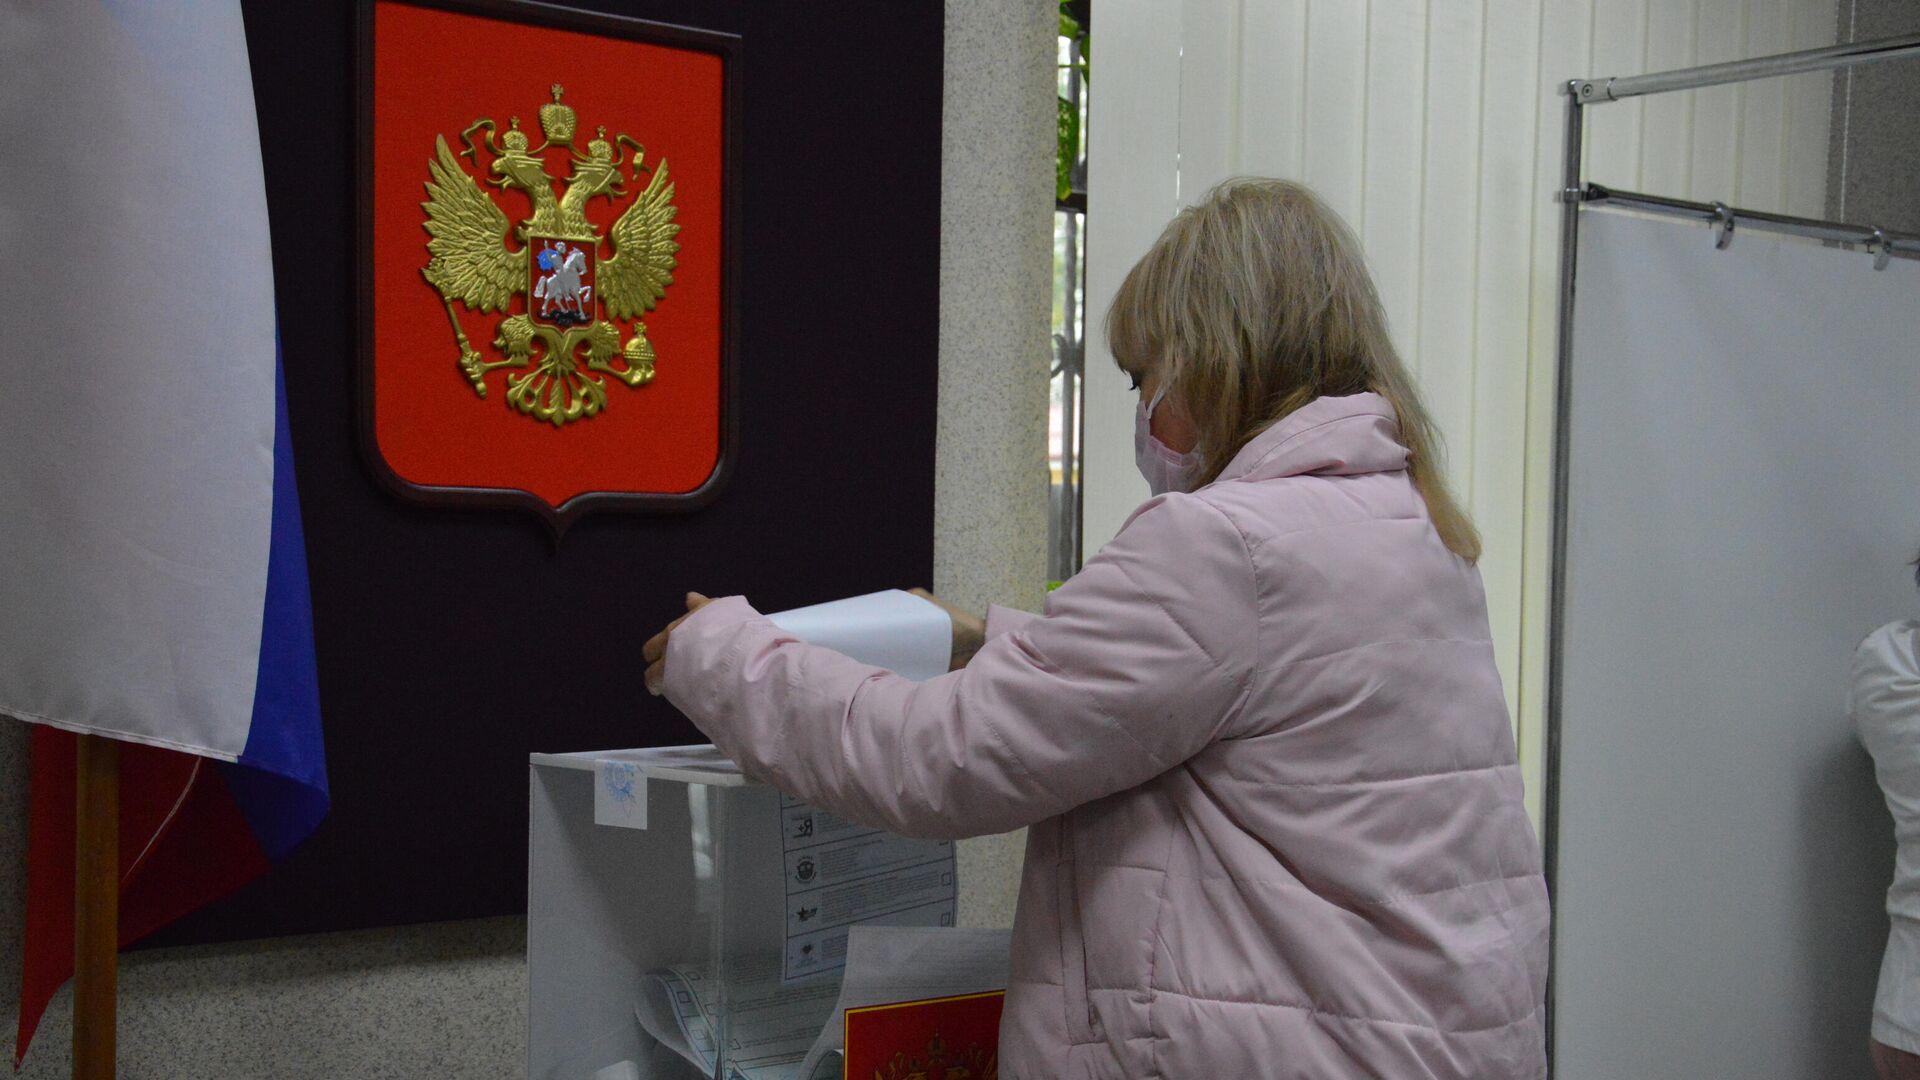 Голосование на выборах в Госдуму на участке в Бресте - Sputnik Беларусь, 1920, 19.09.2021